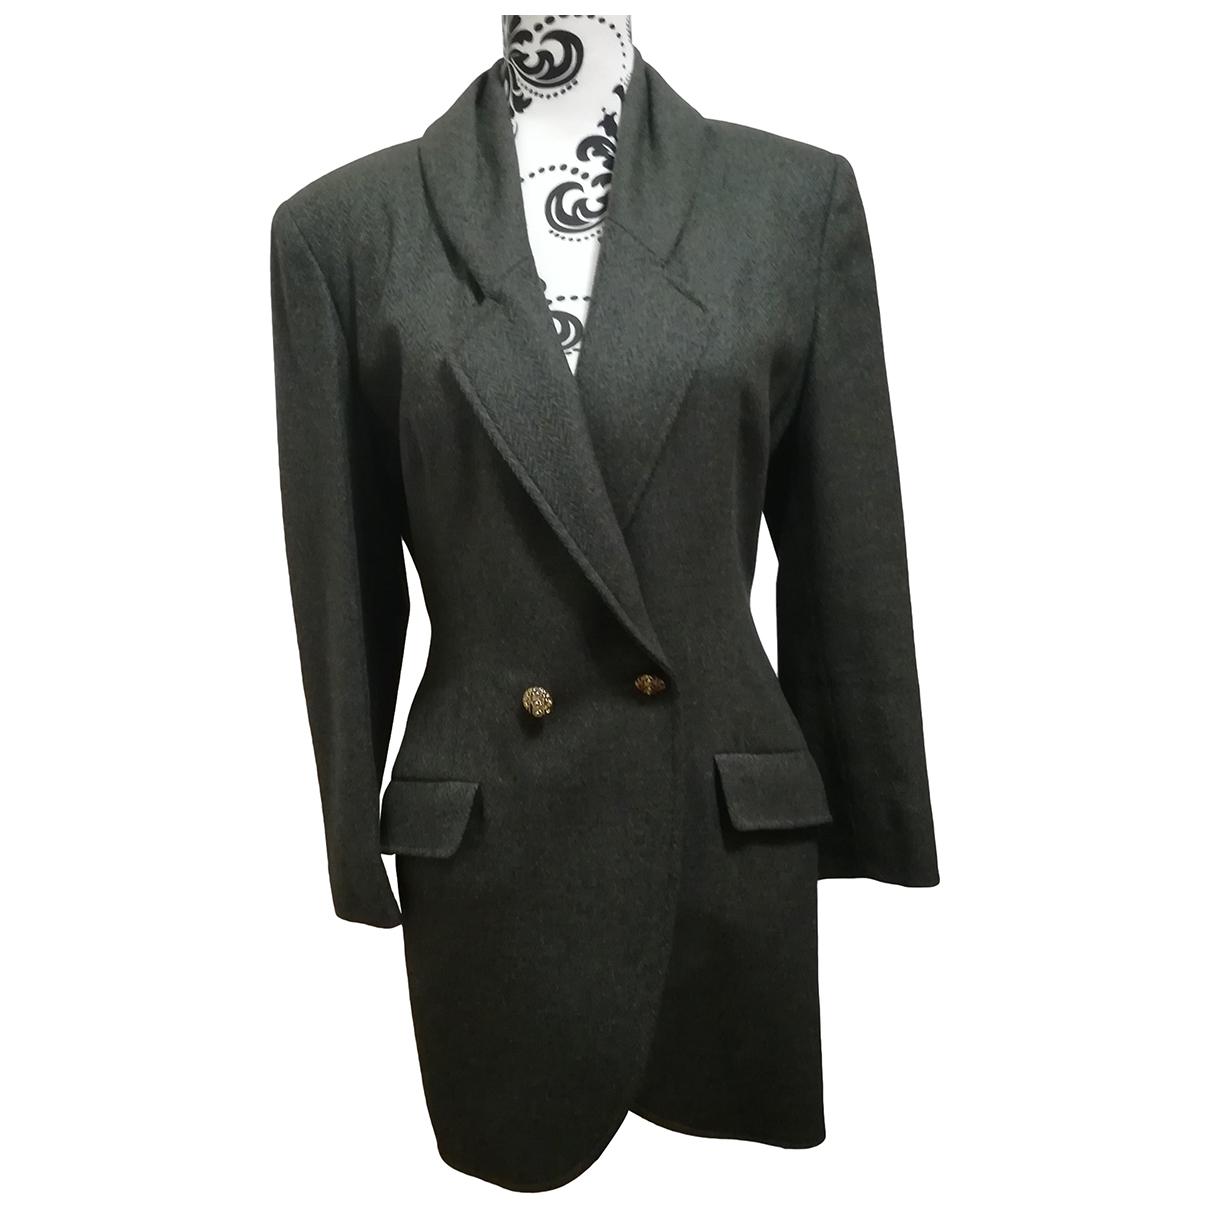 Chiara Boni \N Green Wool jacket for Women 44 IT